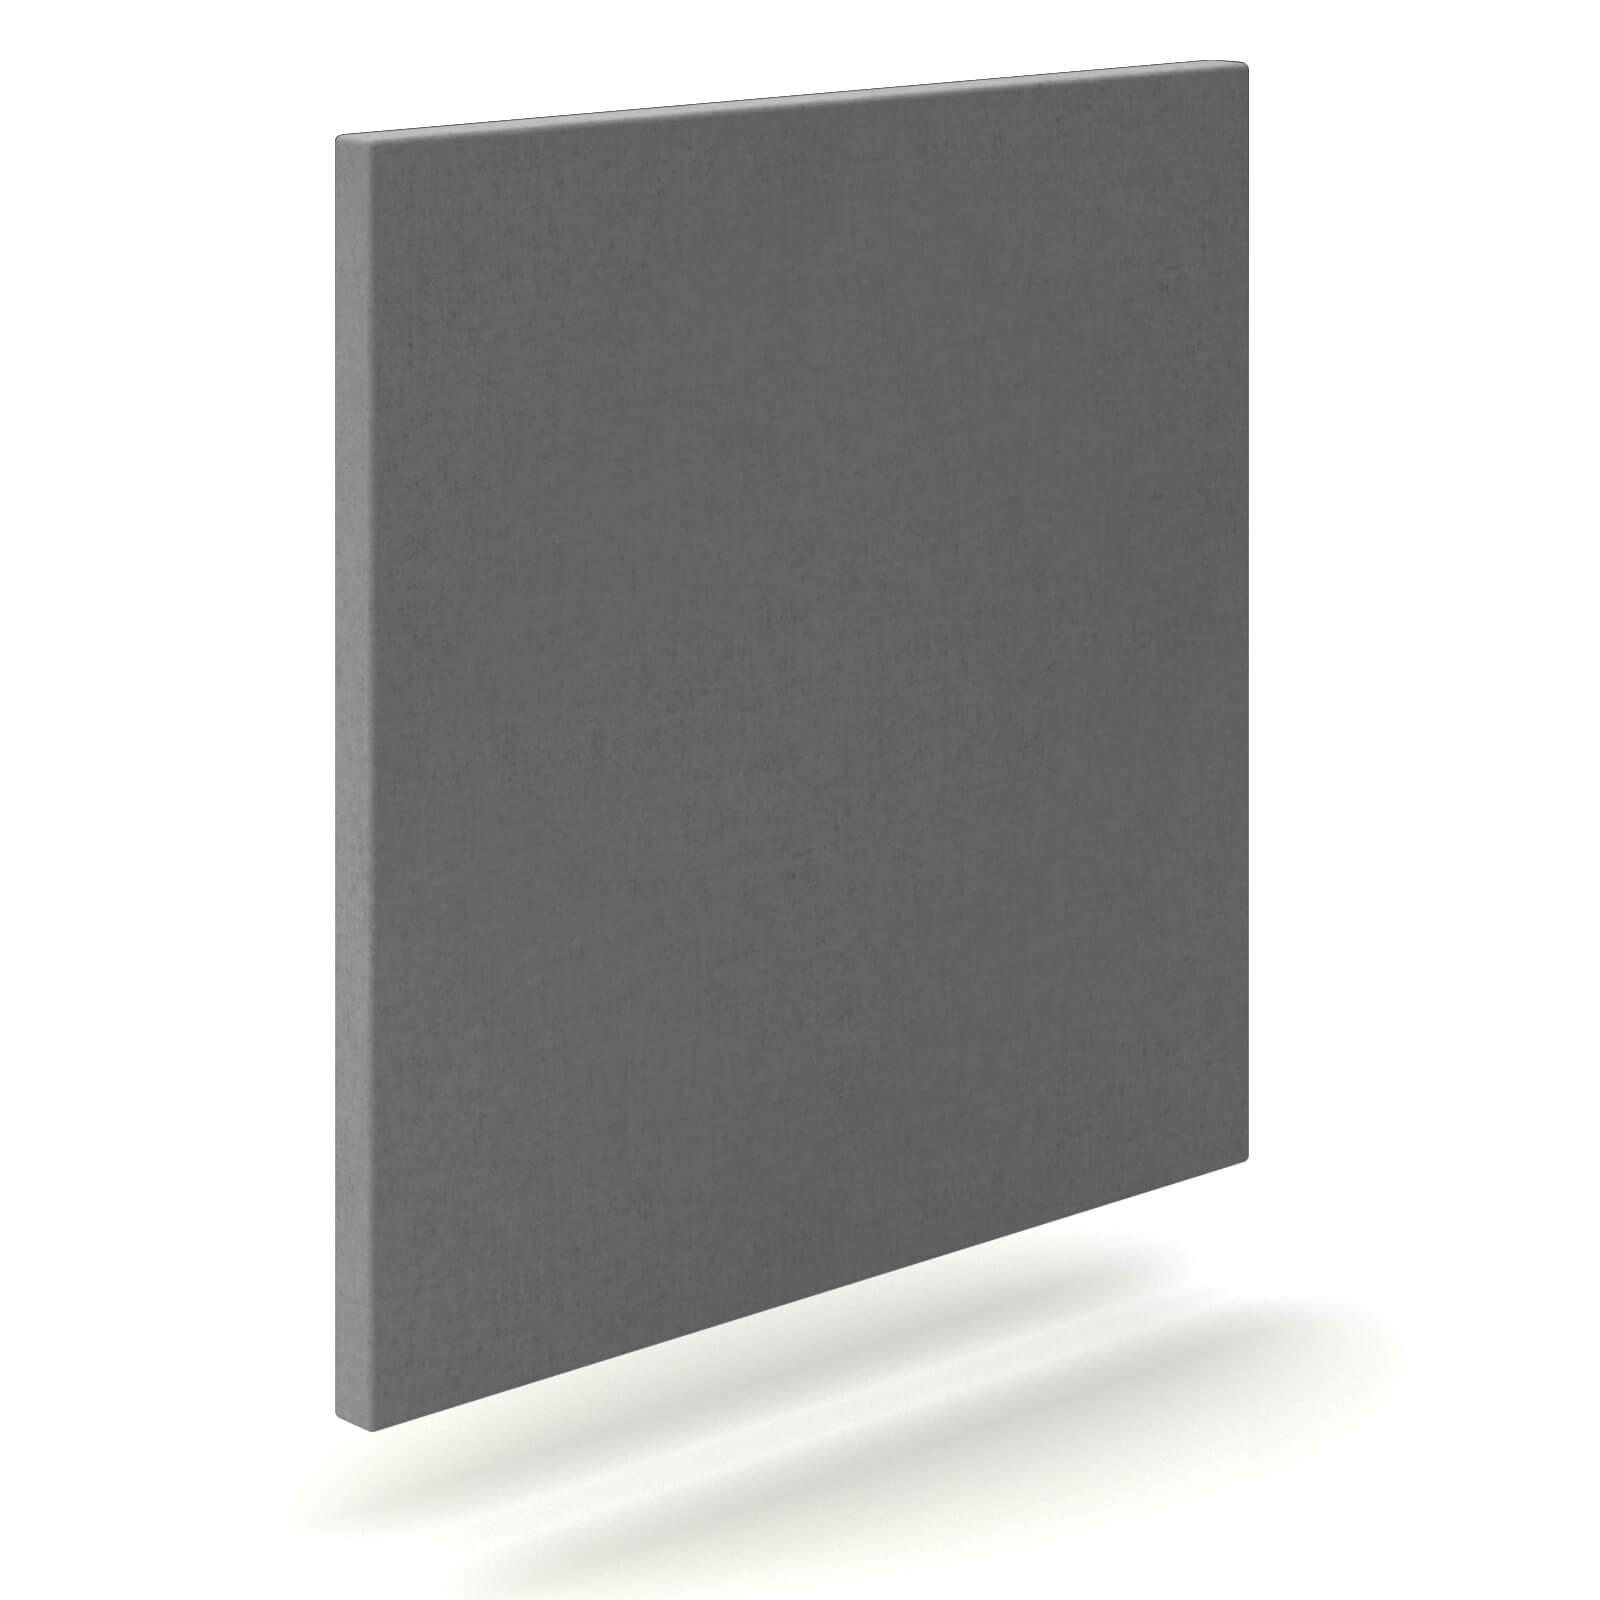 Akustik Deckensegel MODUS 800 x 800 mm horizontal Akustikplatten Paneel Filz